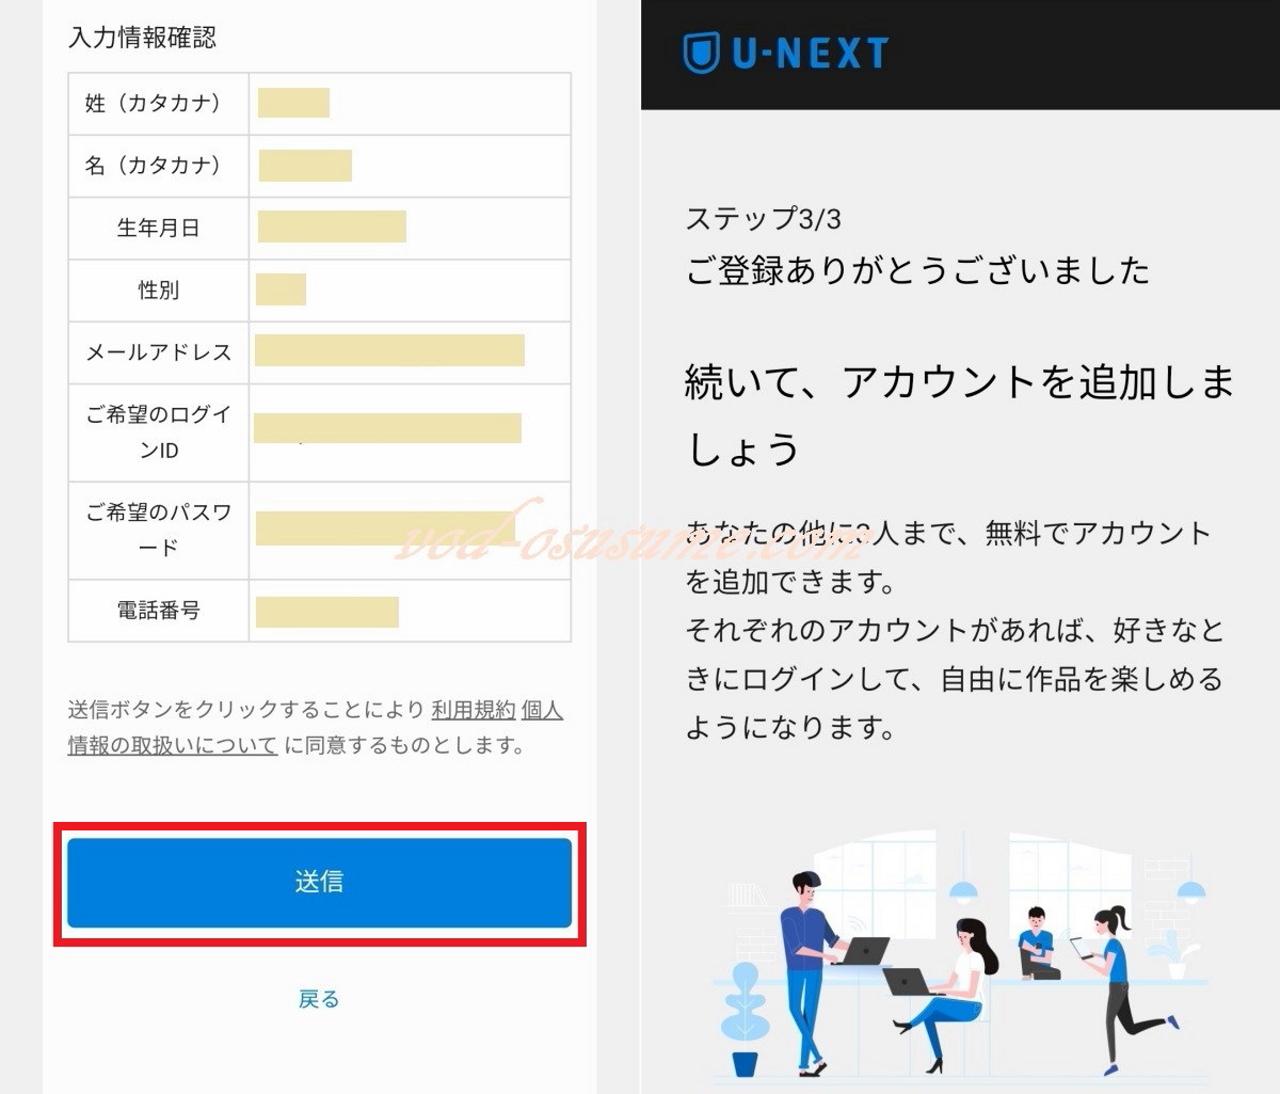 U-NEXTの登録内容を確認